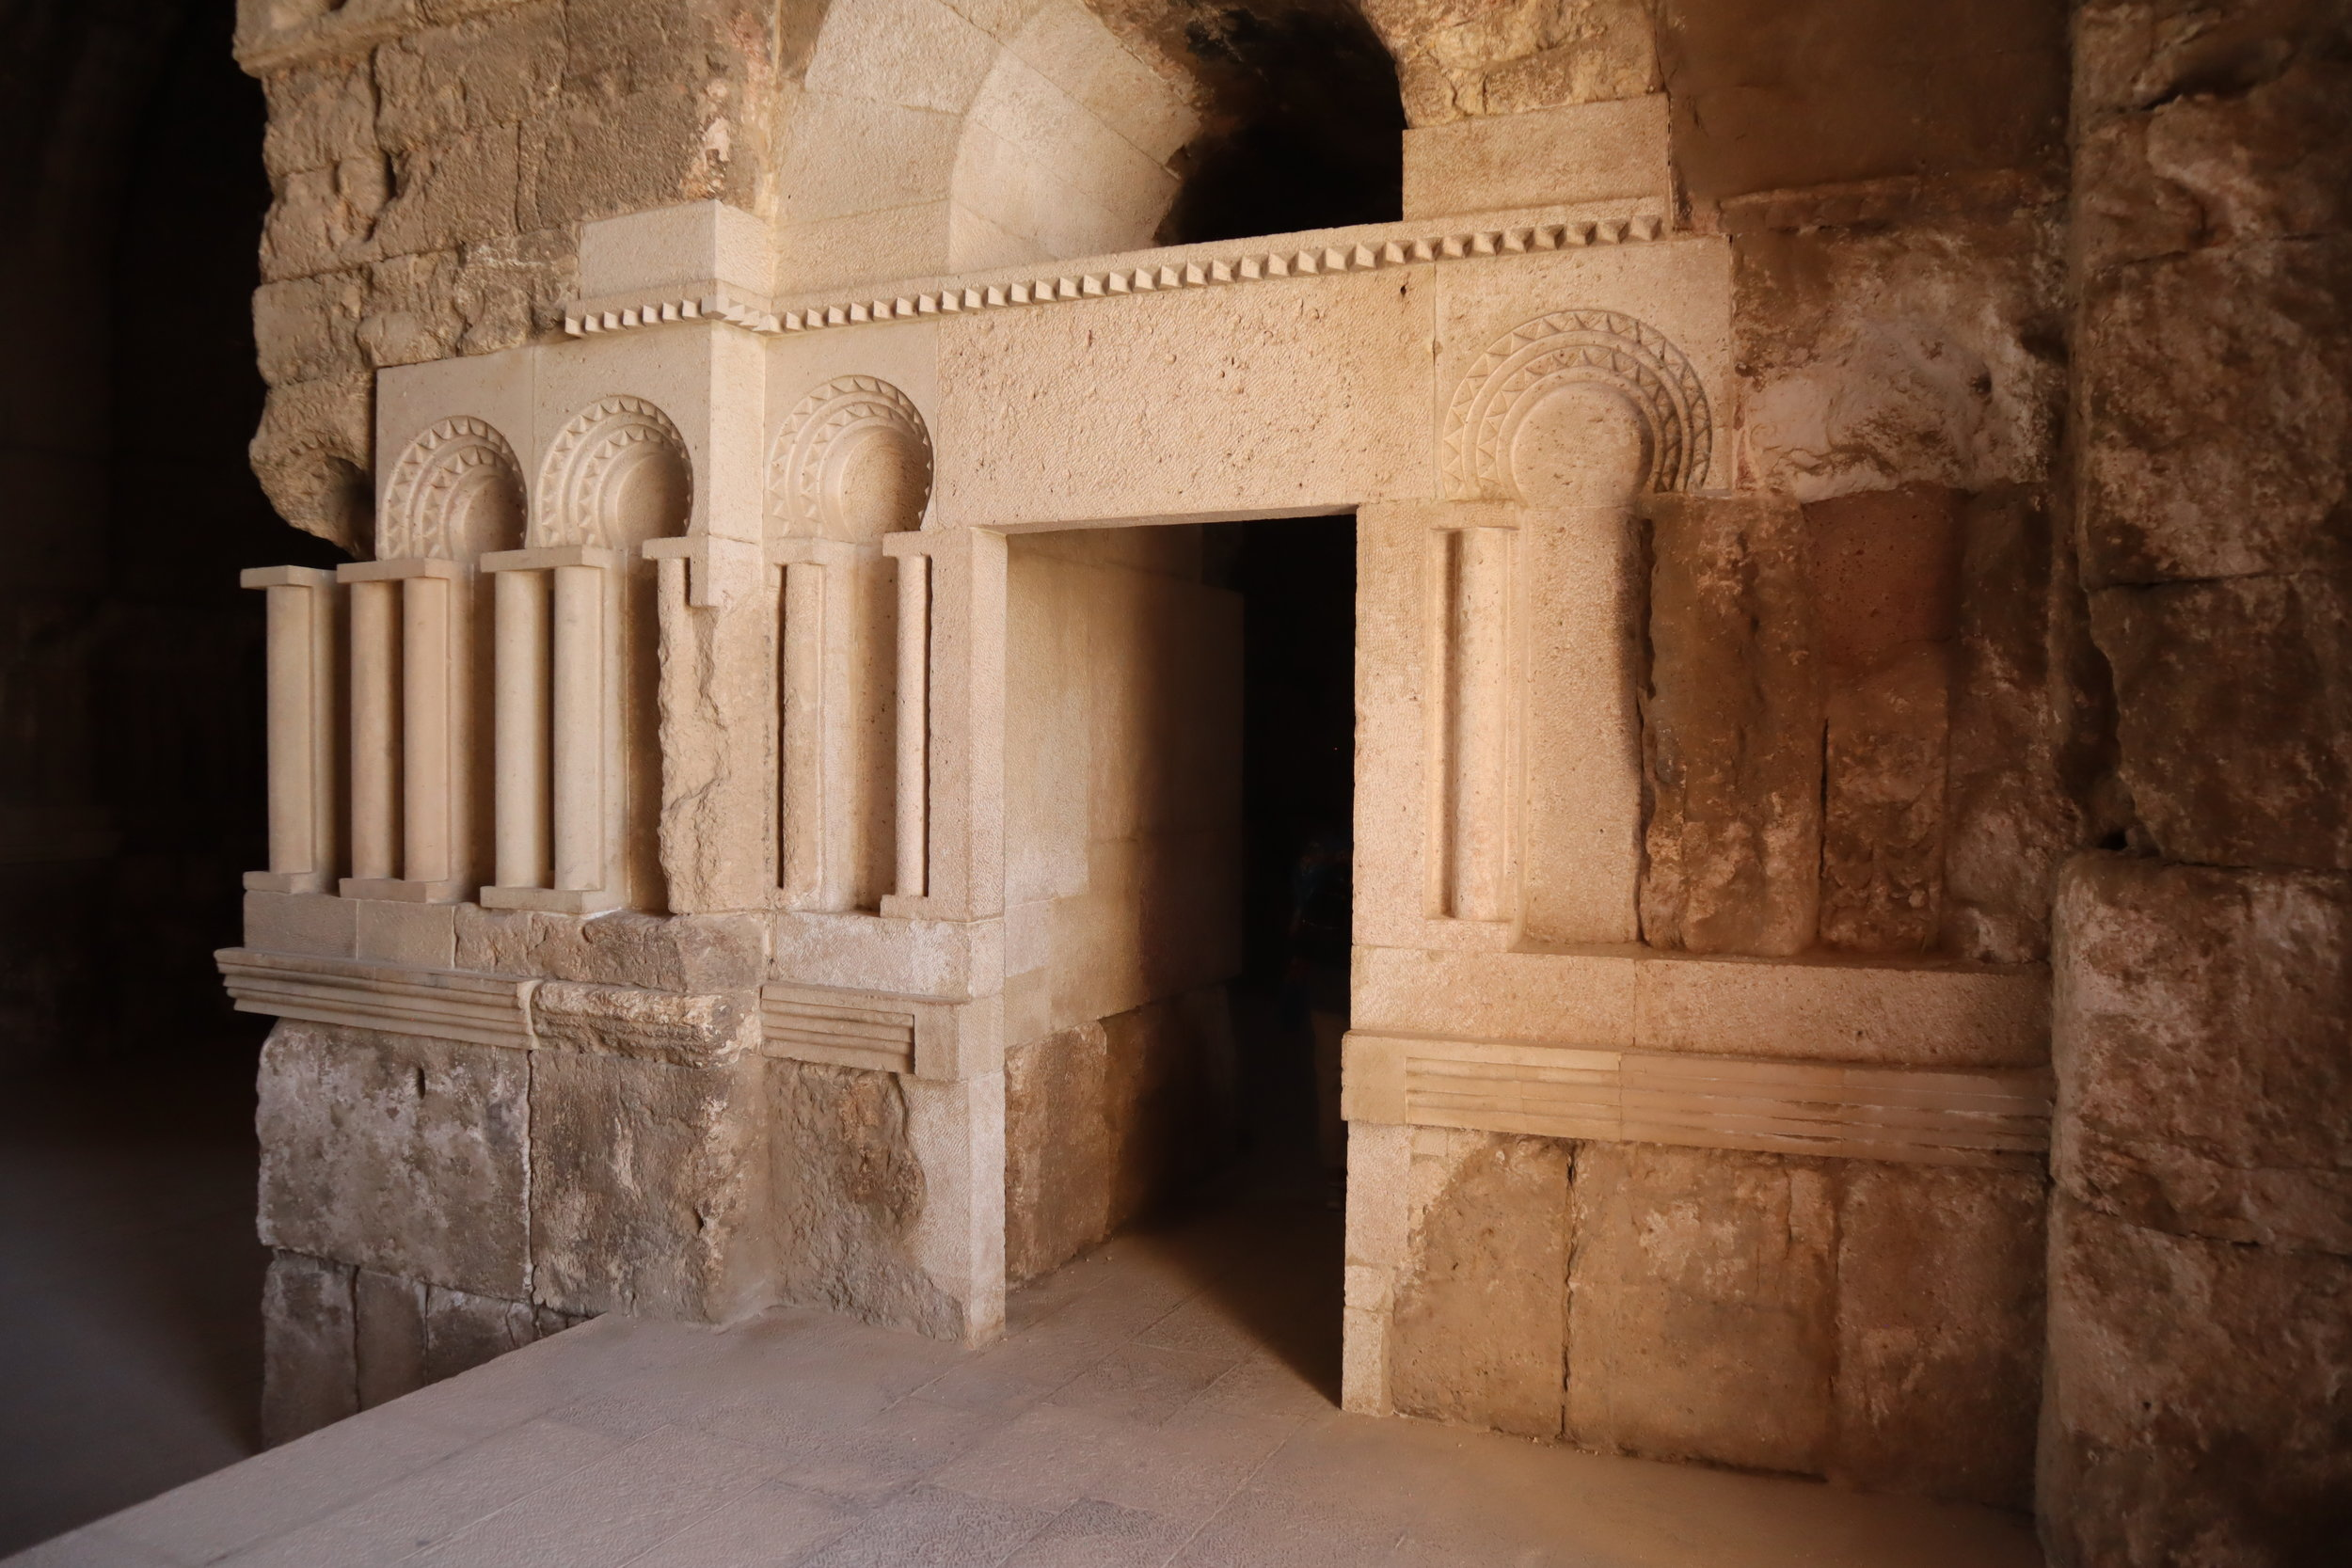 Amman Citadel – Umayyad Palace